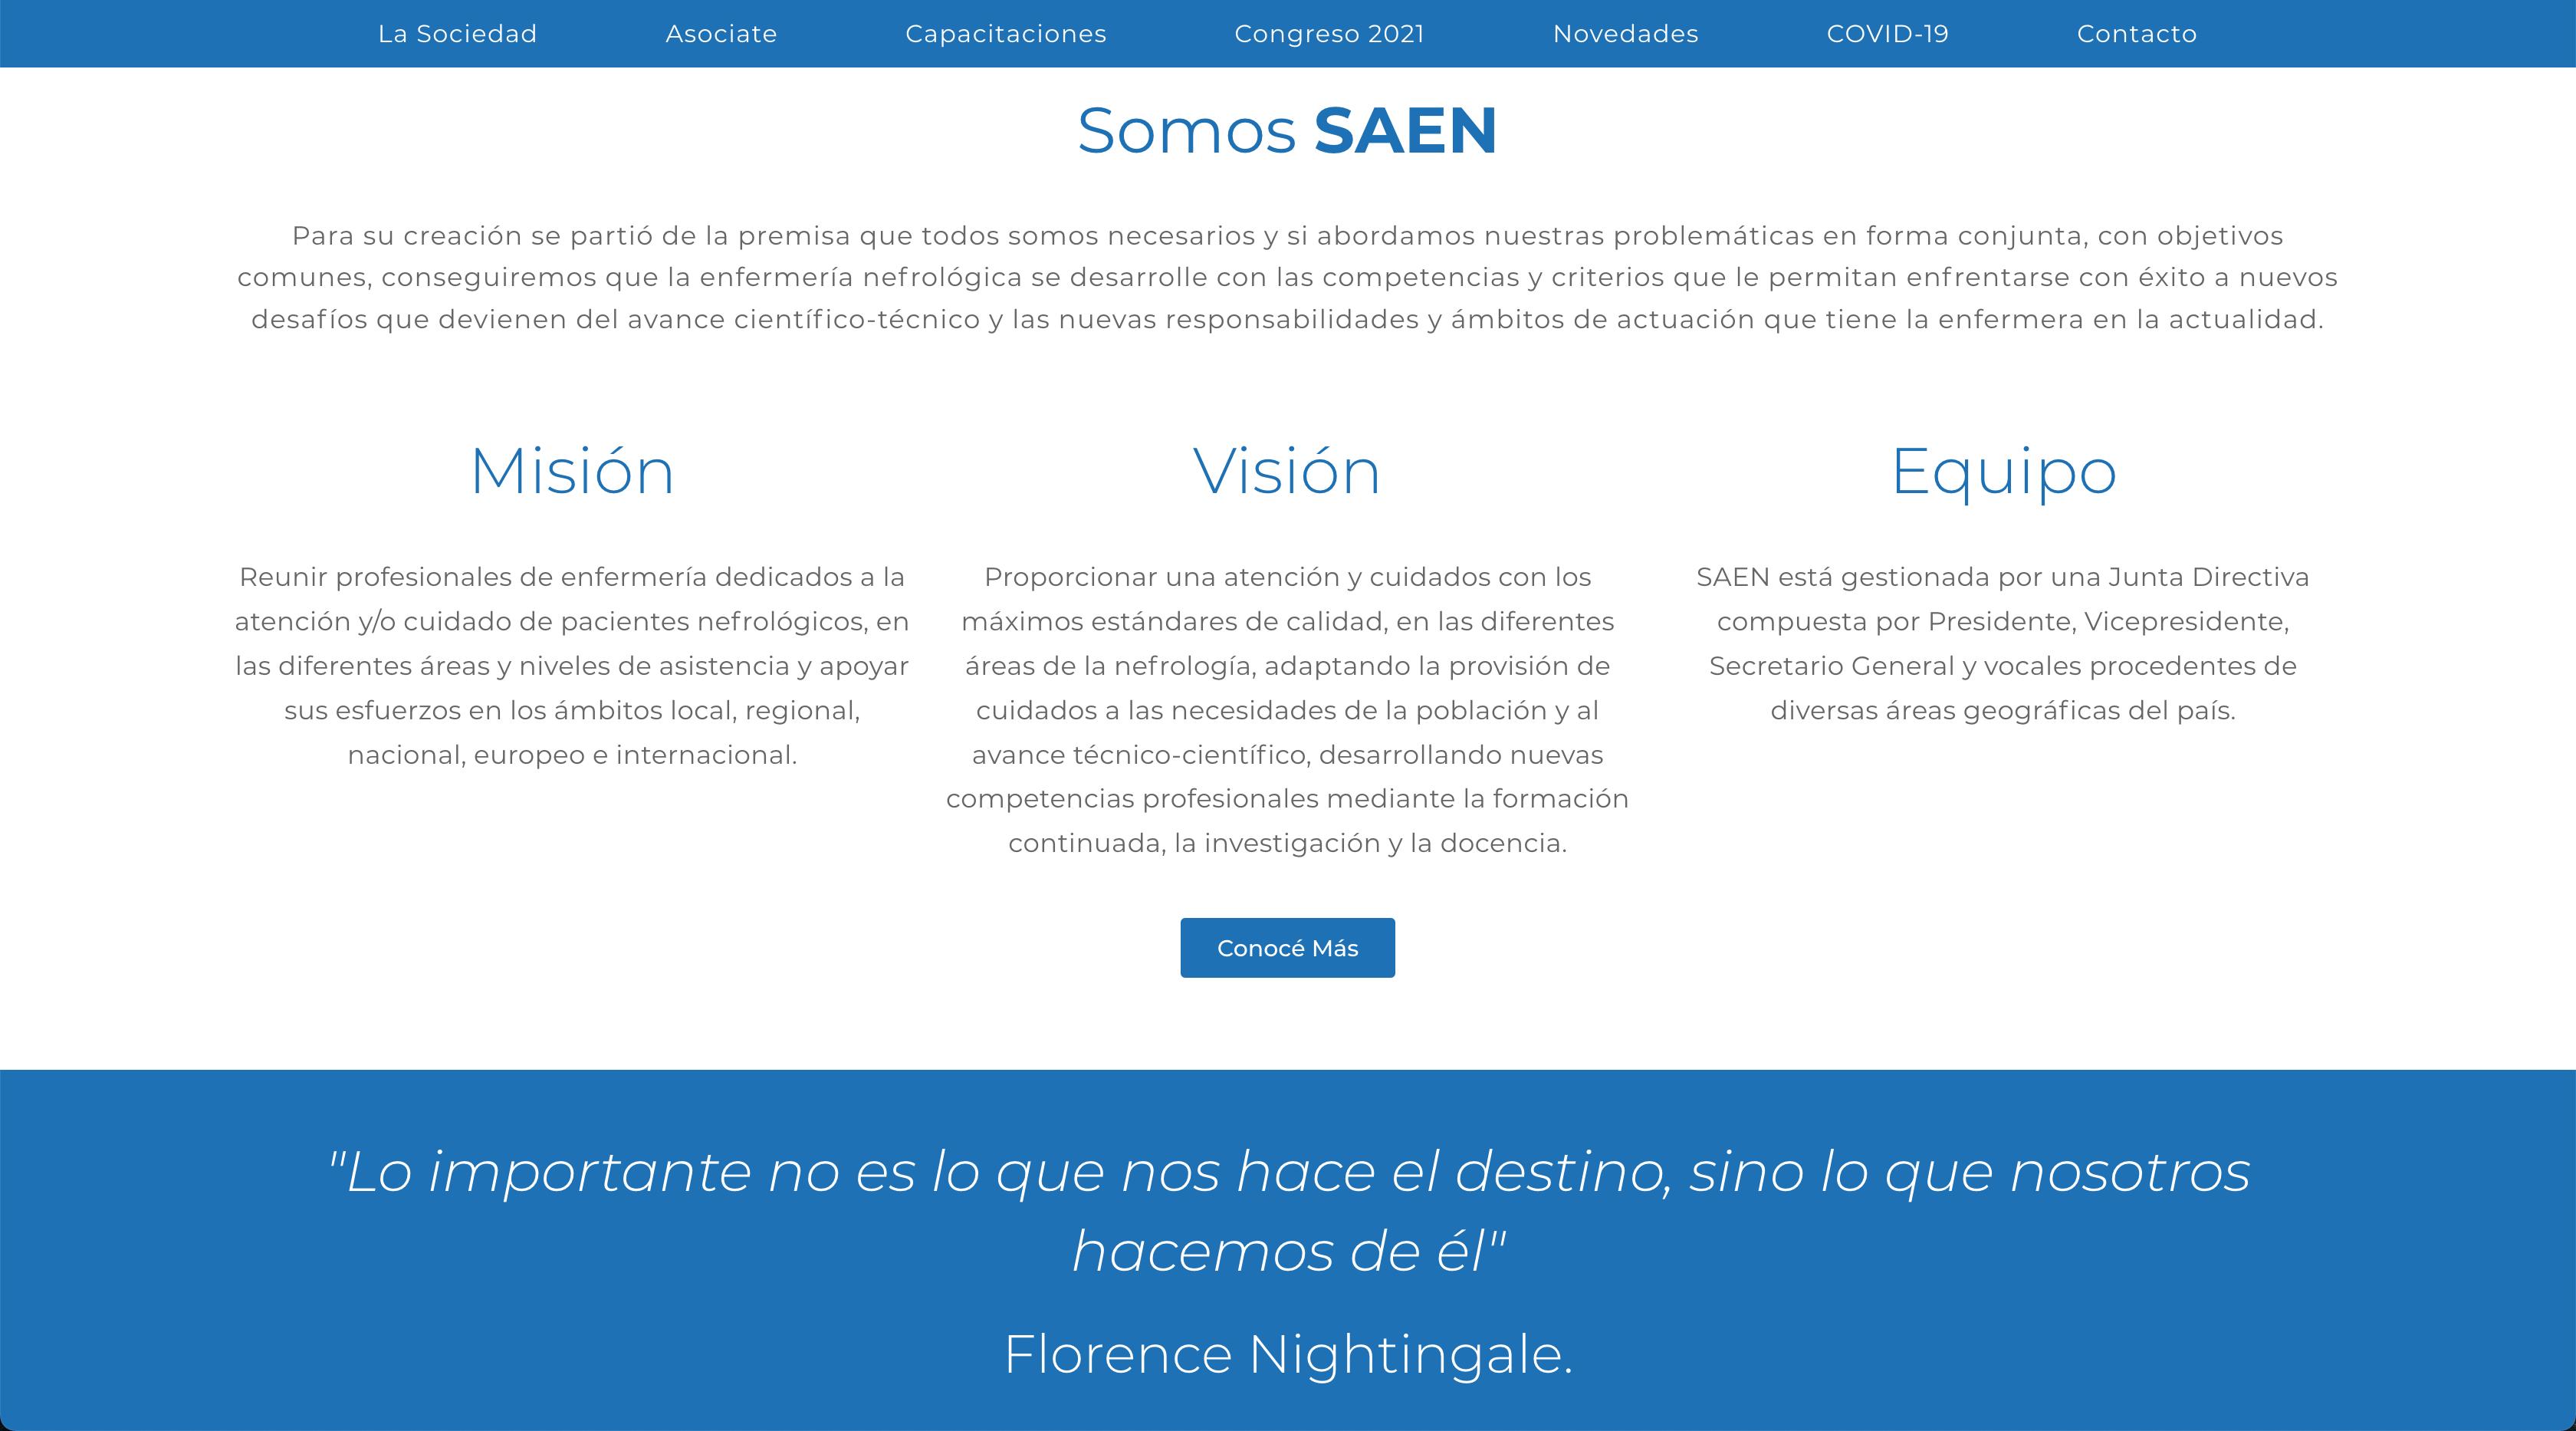 saen-sociedad-argentina-de-enfermeria-nefrologica-online-lab-web-development-web-design-4